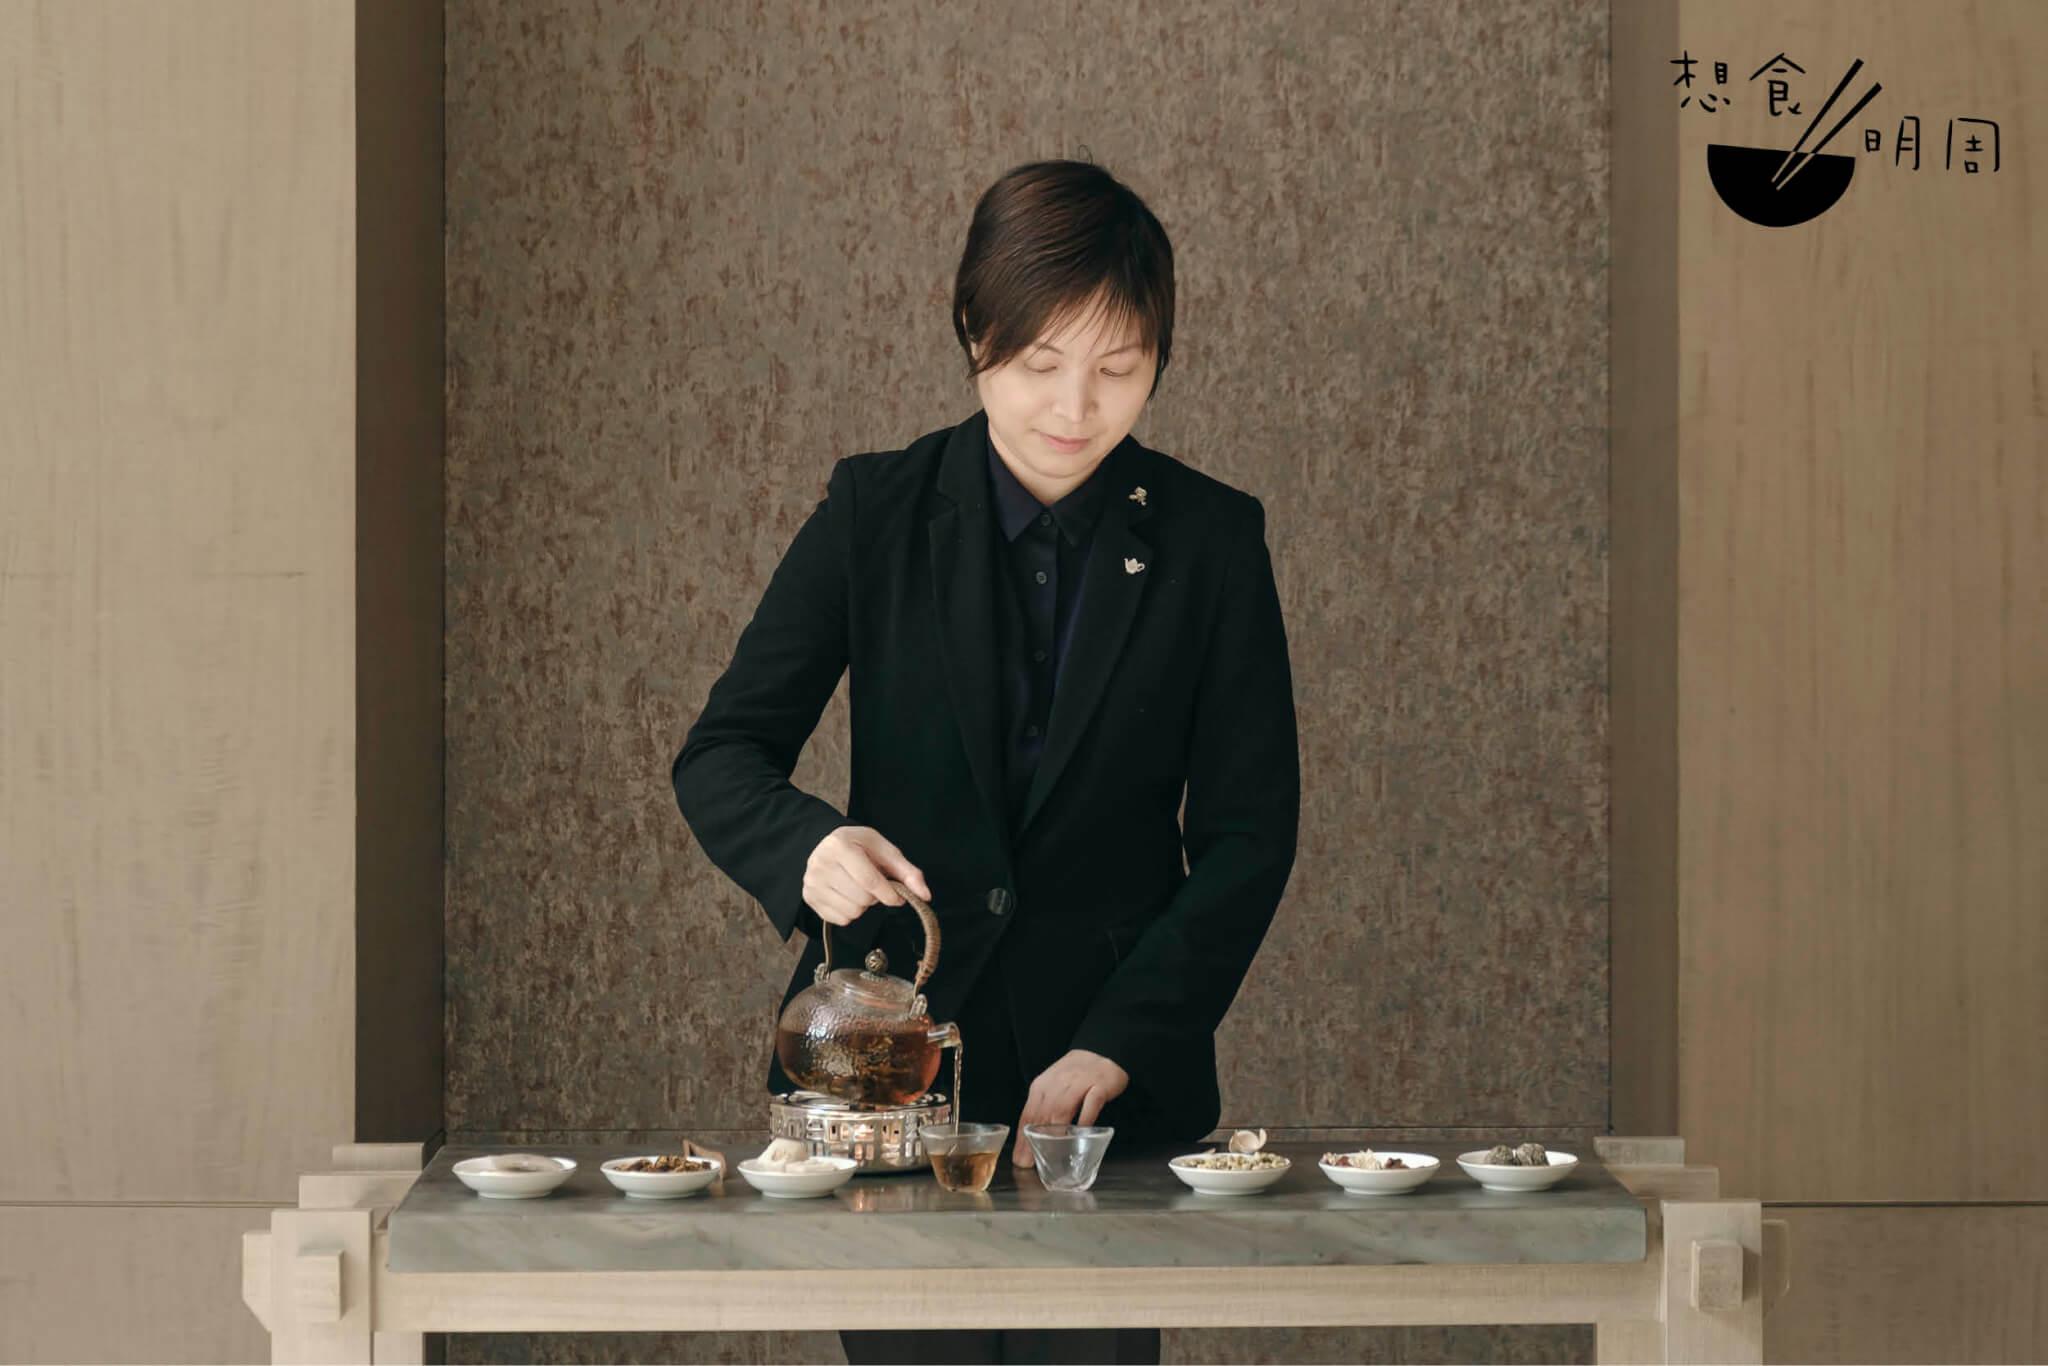 Kezia // 中菜廳「潤」的餐廳經理兼茶藝師